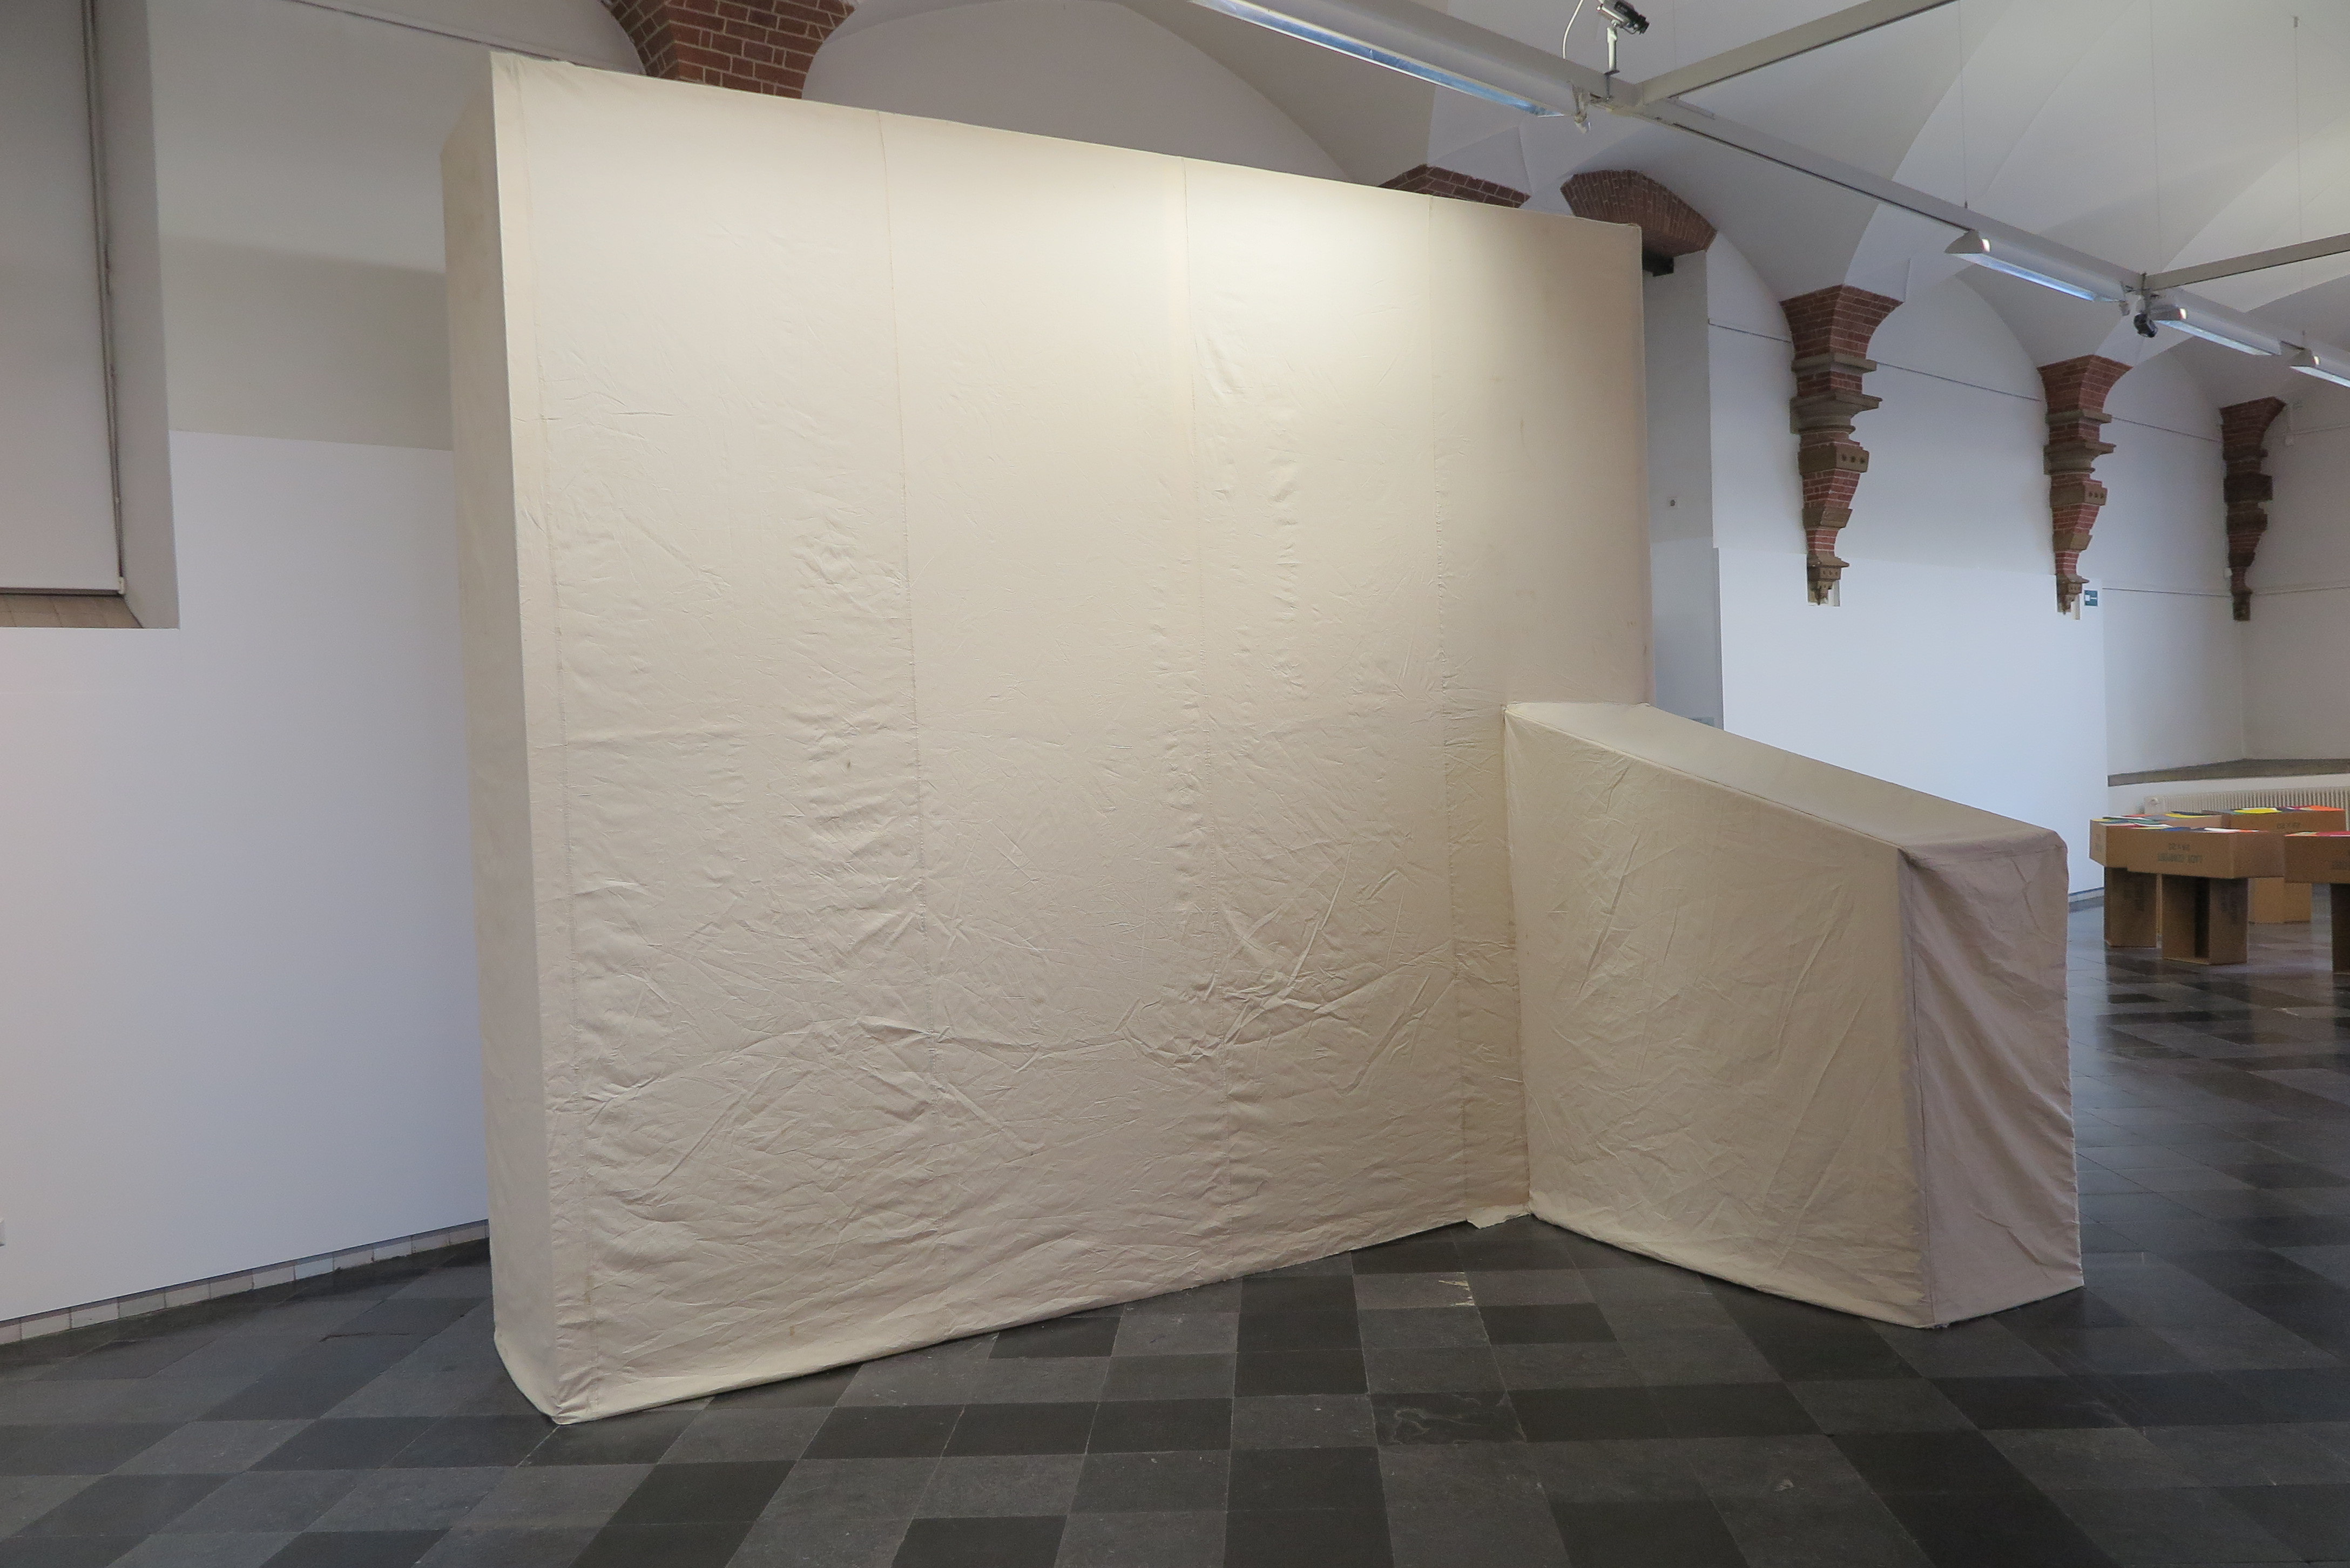 Philippe van Snick, Synthese van traditionele l vormige kamer 2